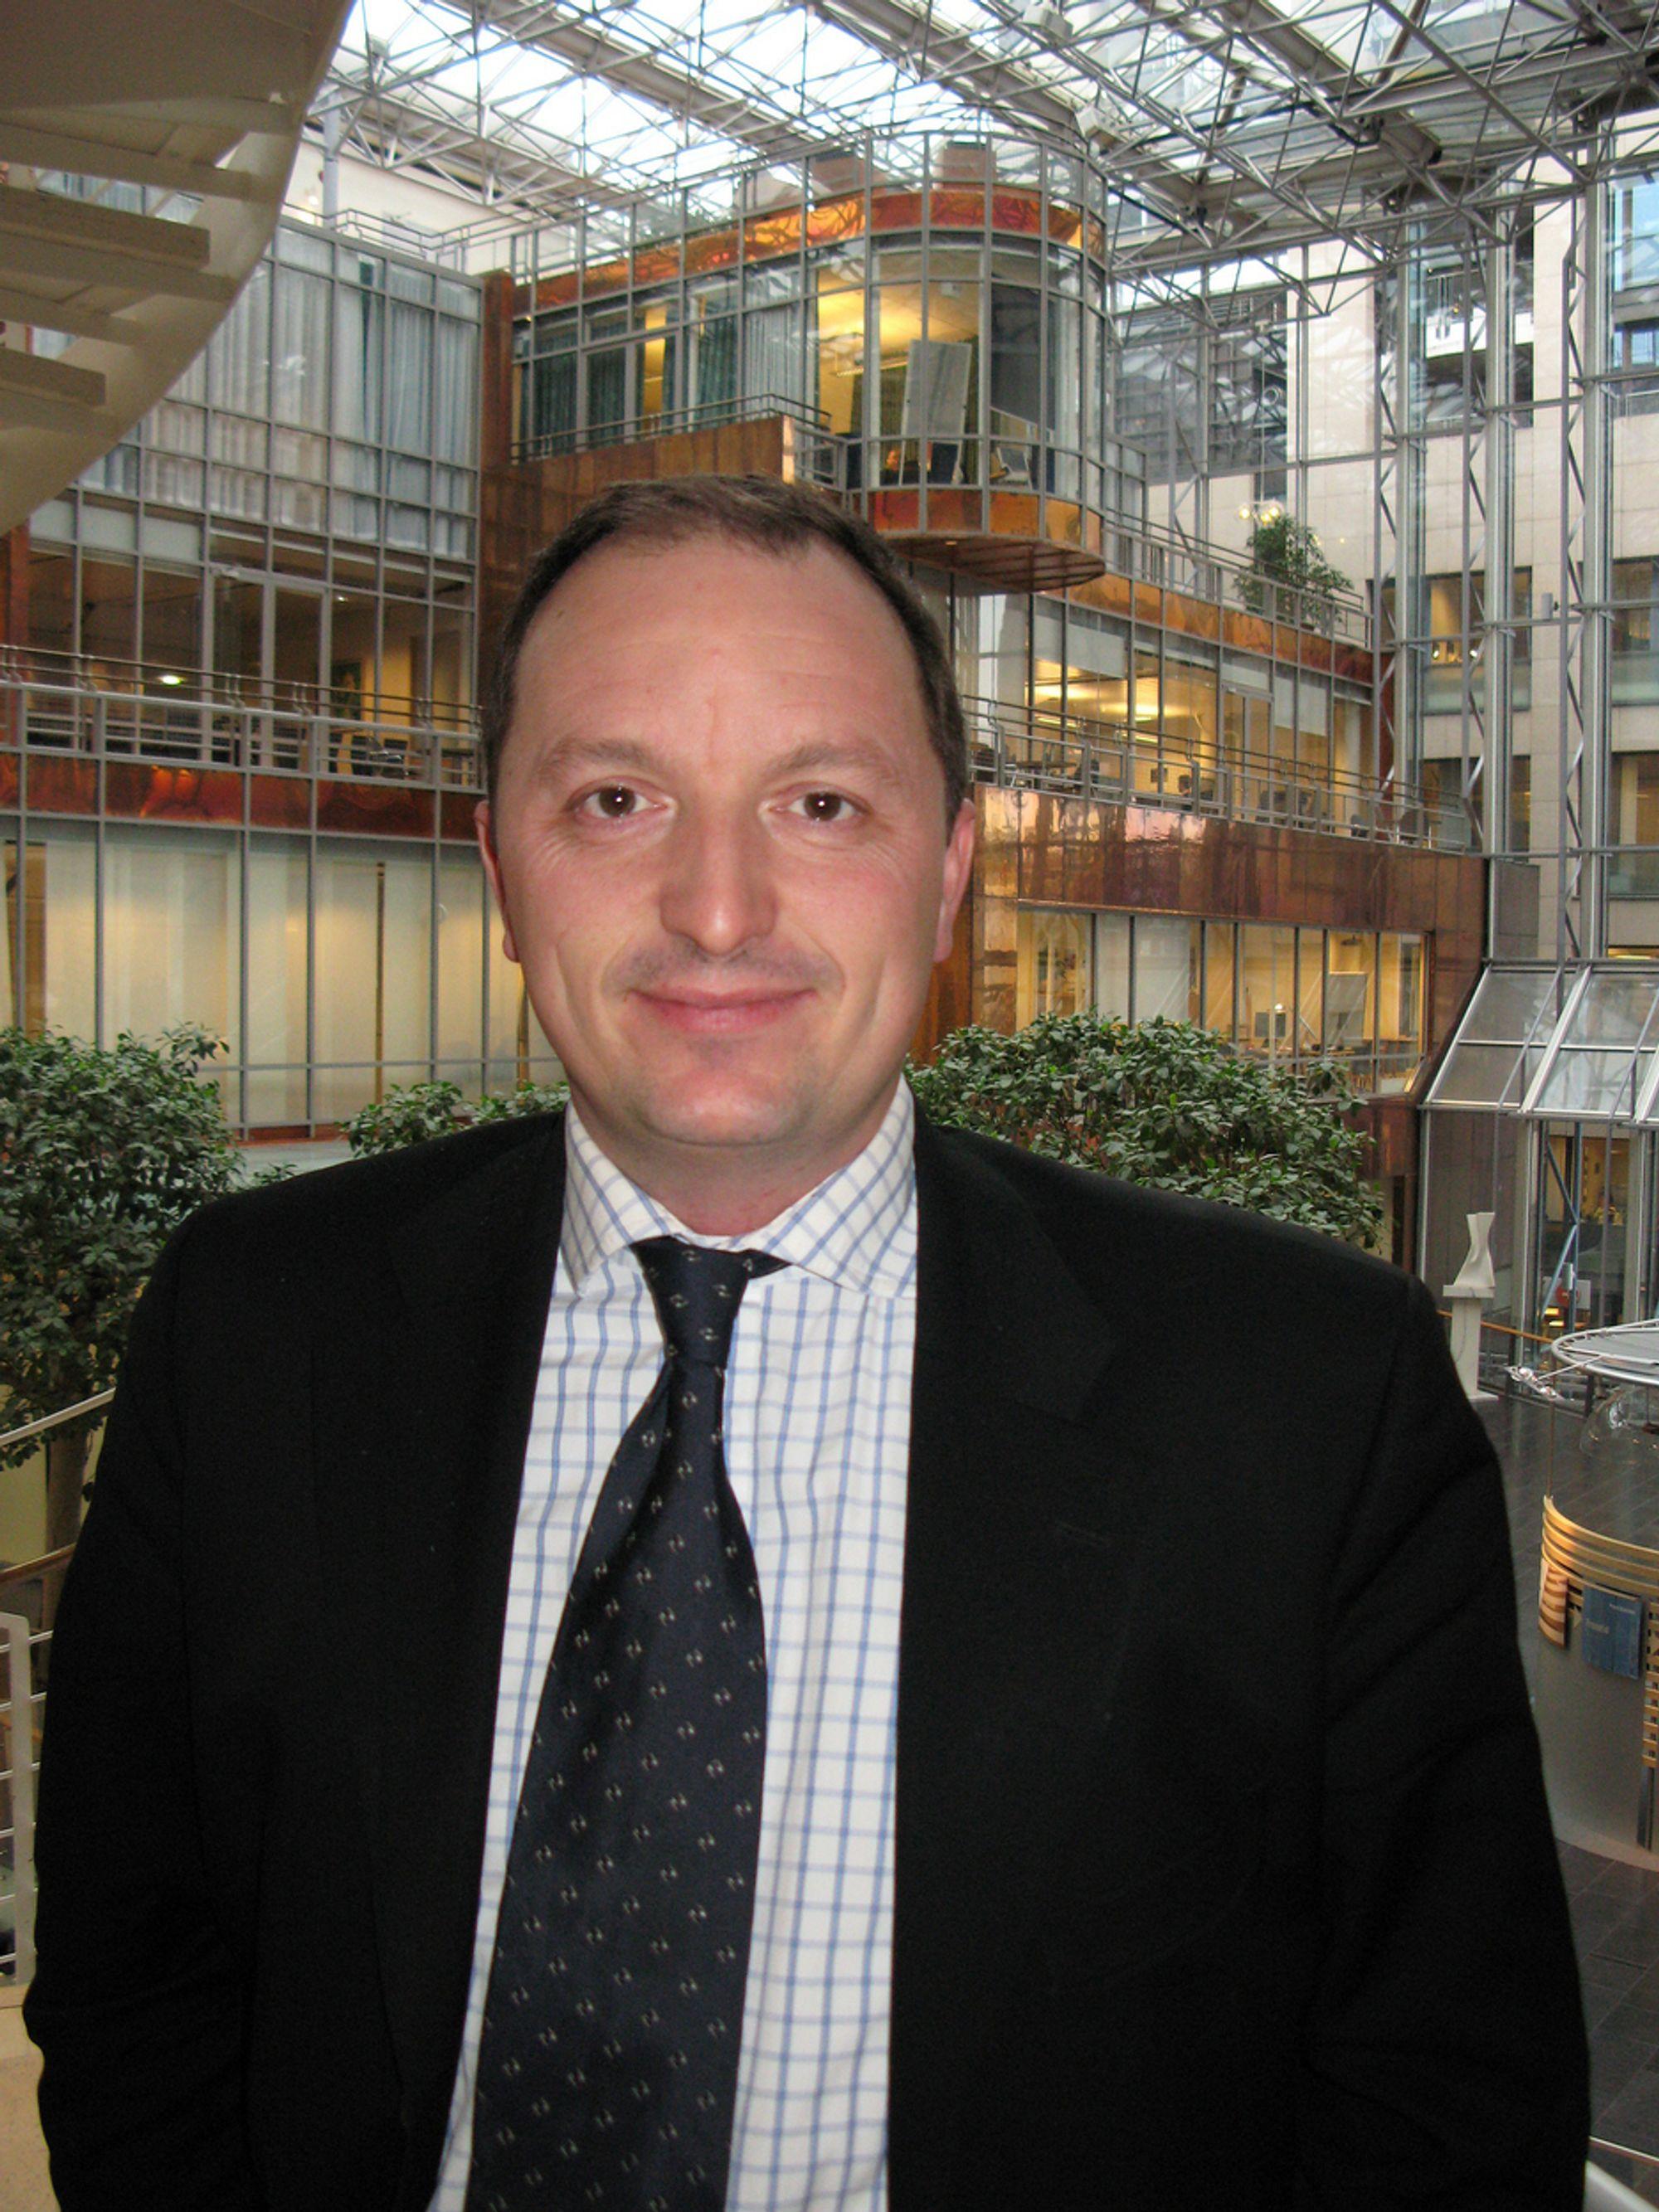 TROR PÅ BUDSJETTSPREKK: Oljeaksjeanalytiker Gudmund Halle Isfeldt i DnBNOR Markets tror Hydro vil slite i forhold til planlagt budsjett.